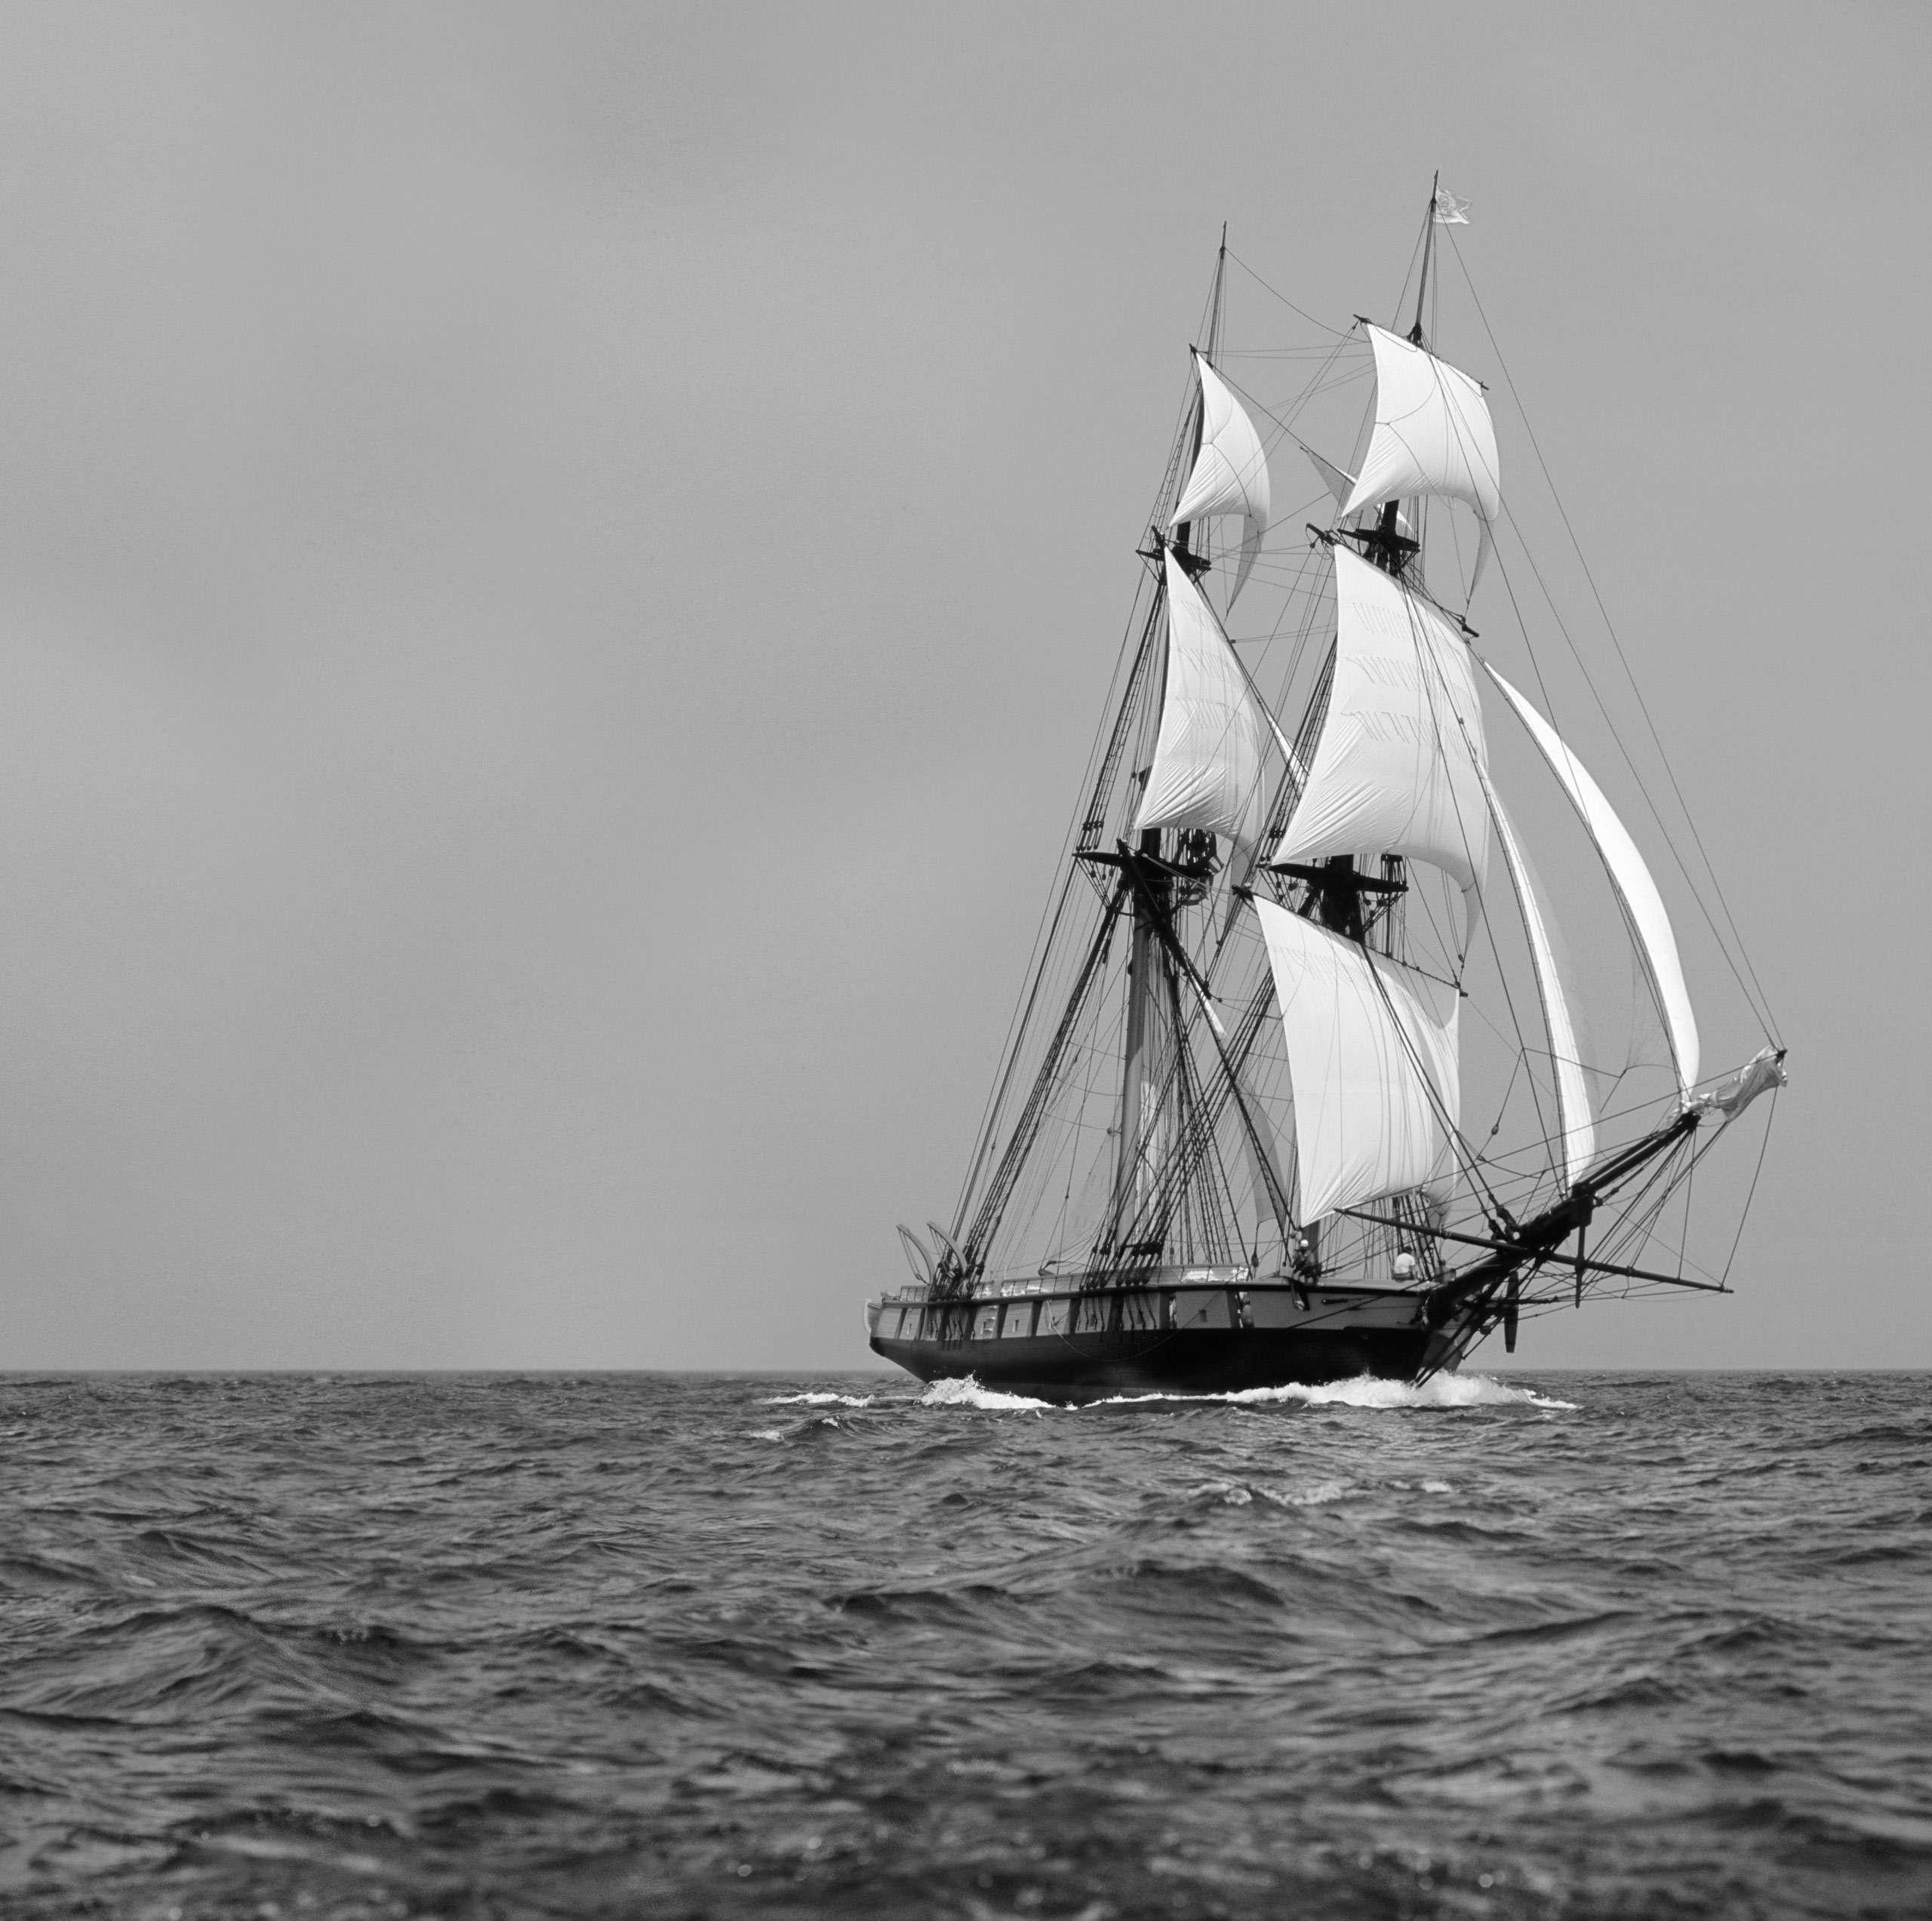 PORTFOLIO - Sailing - Tall Ships #24-PCG256